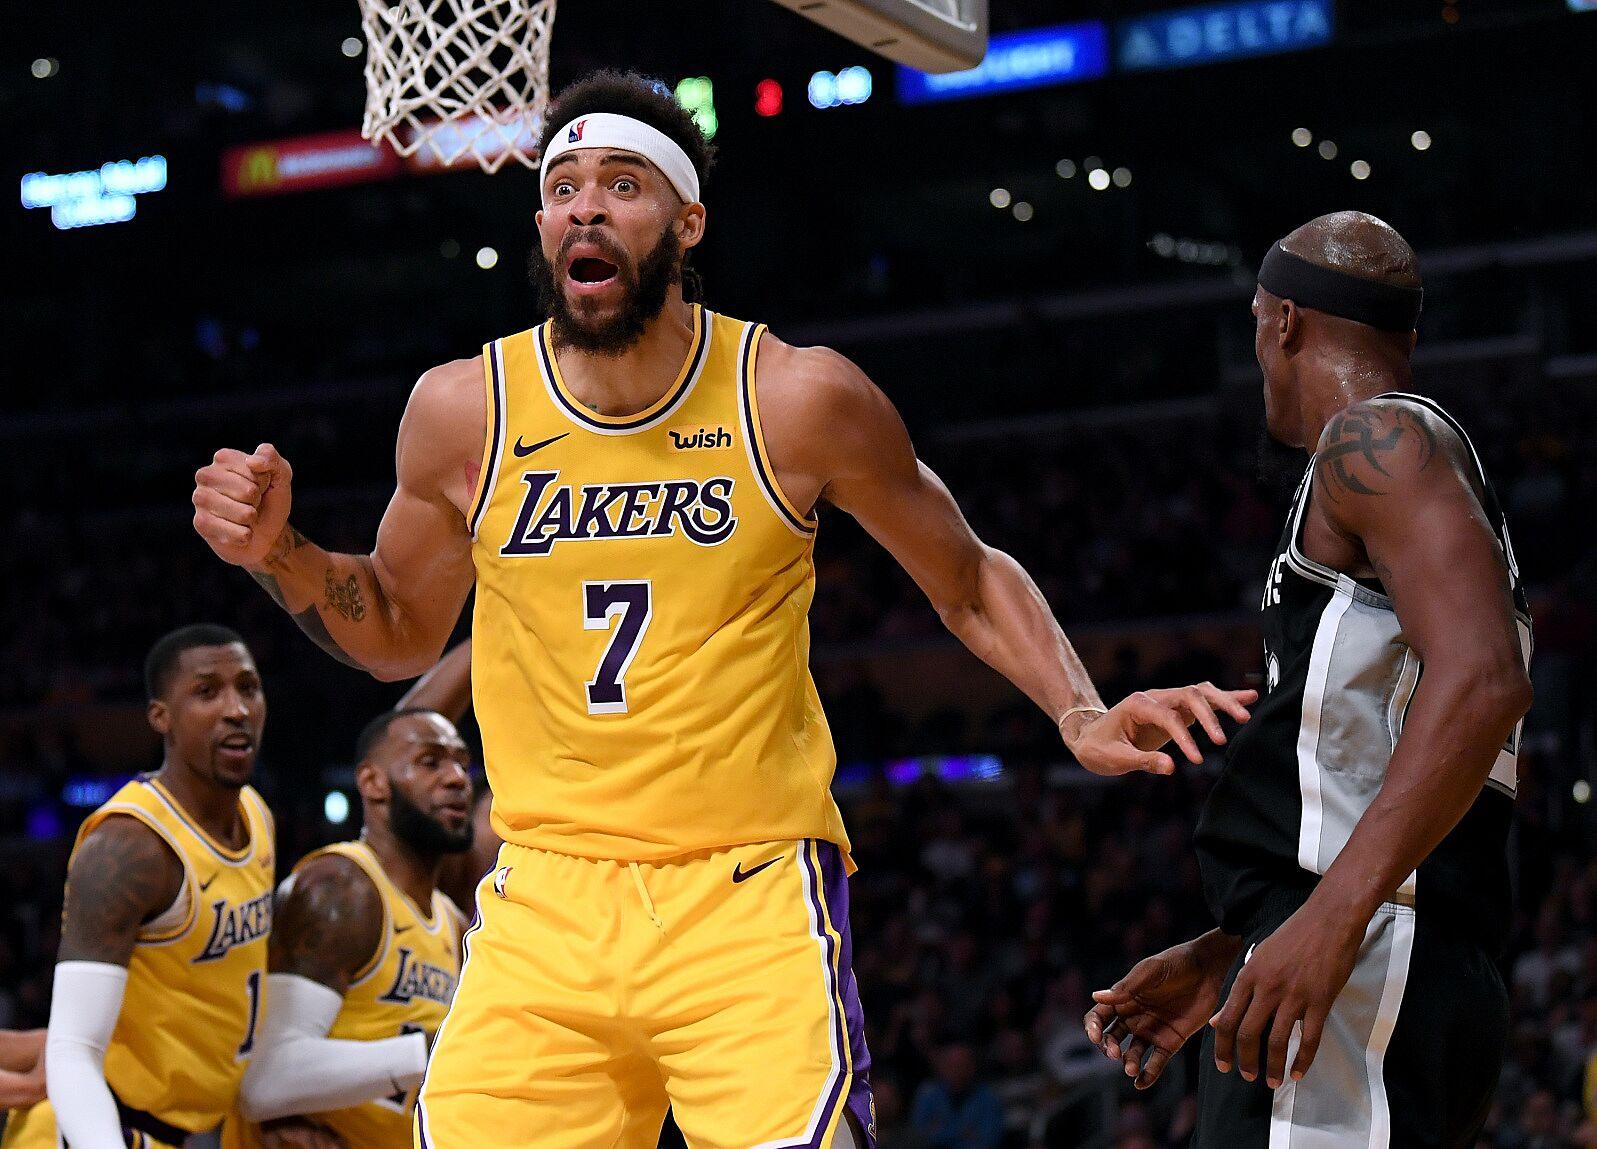 Risultati immagini per JAVALE MCGEE, Los Angeles Lakers